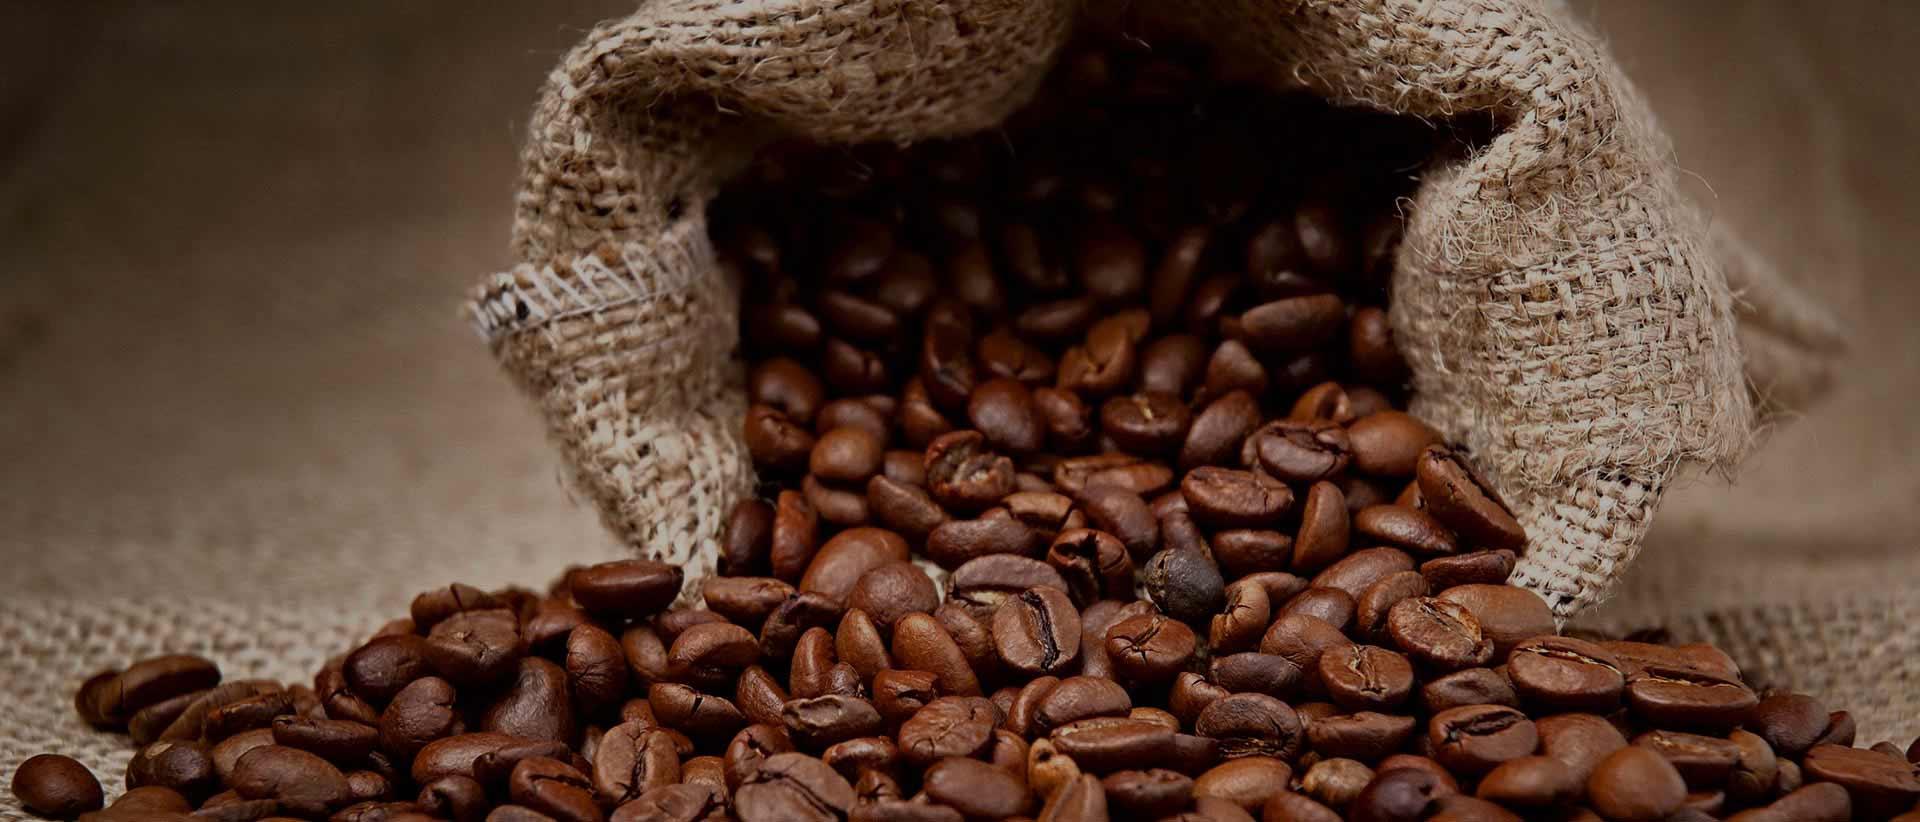 DECAF COFFEE BEANS